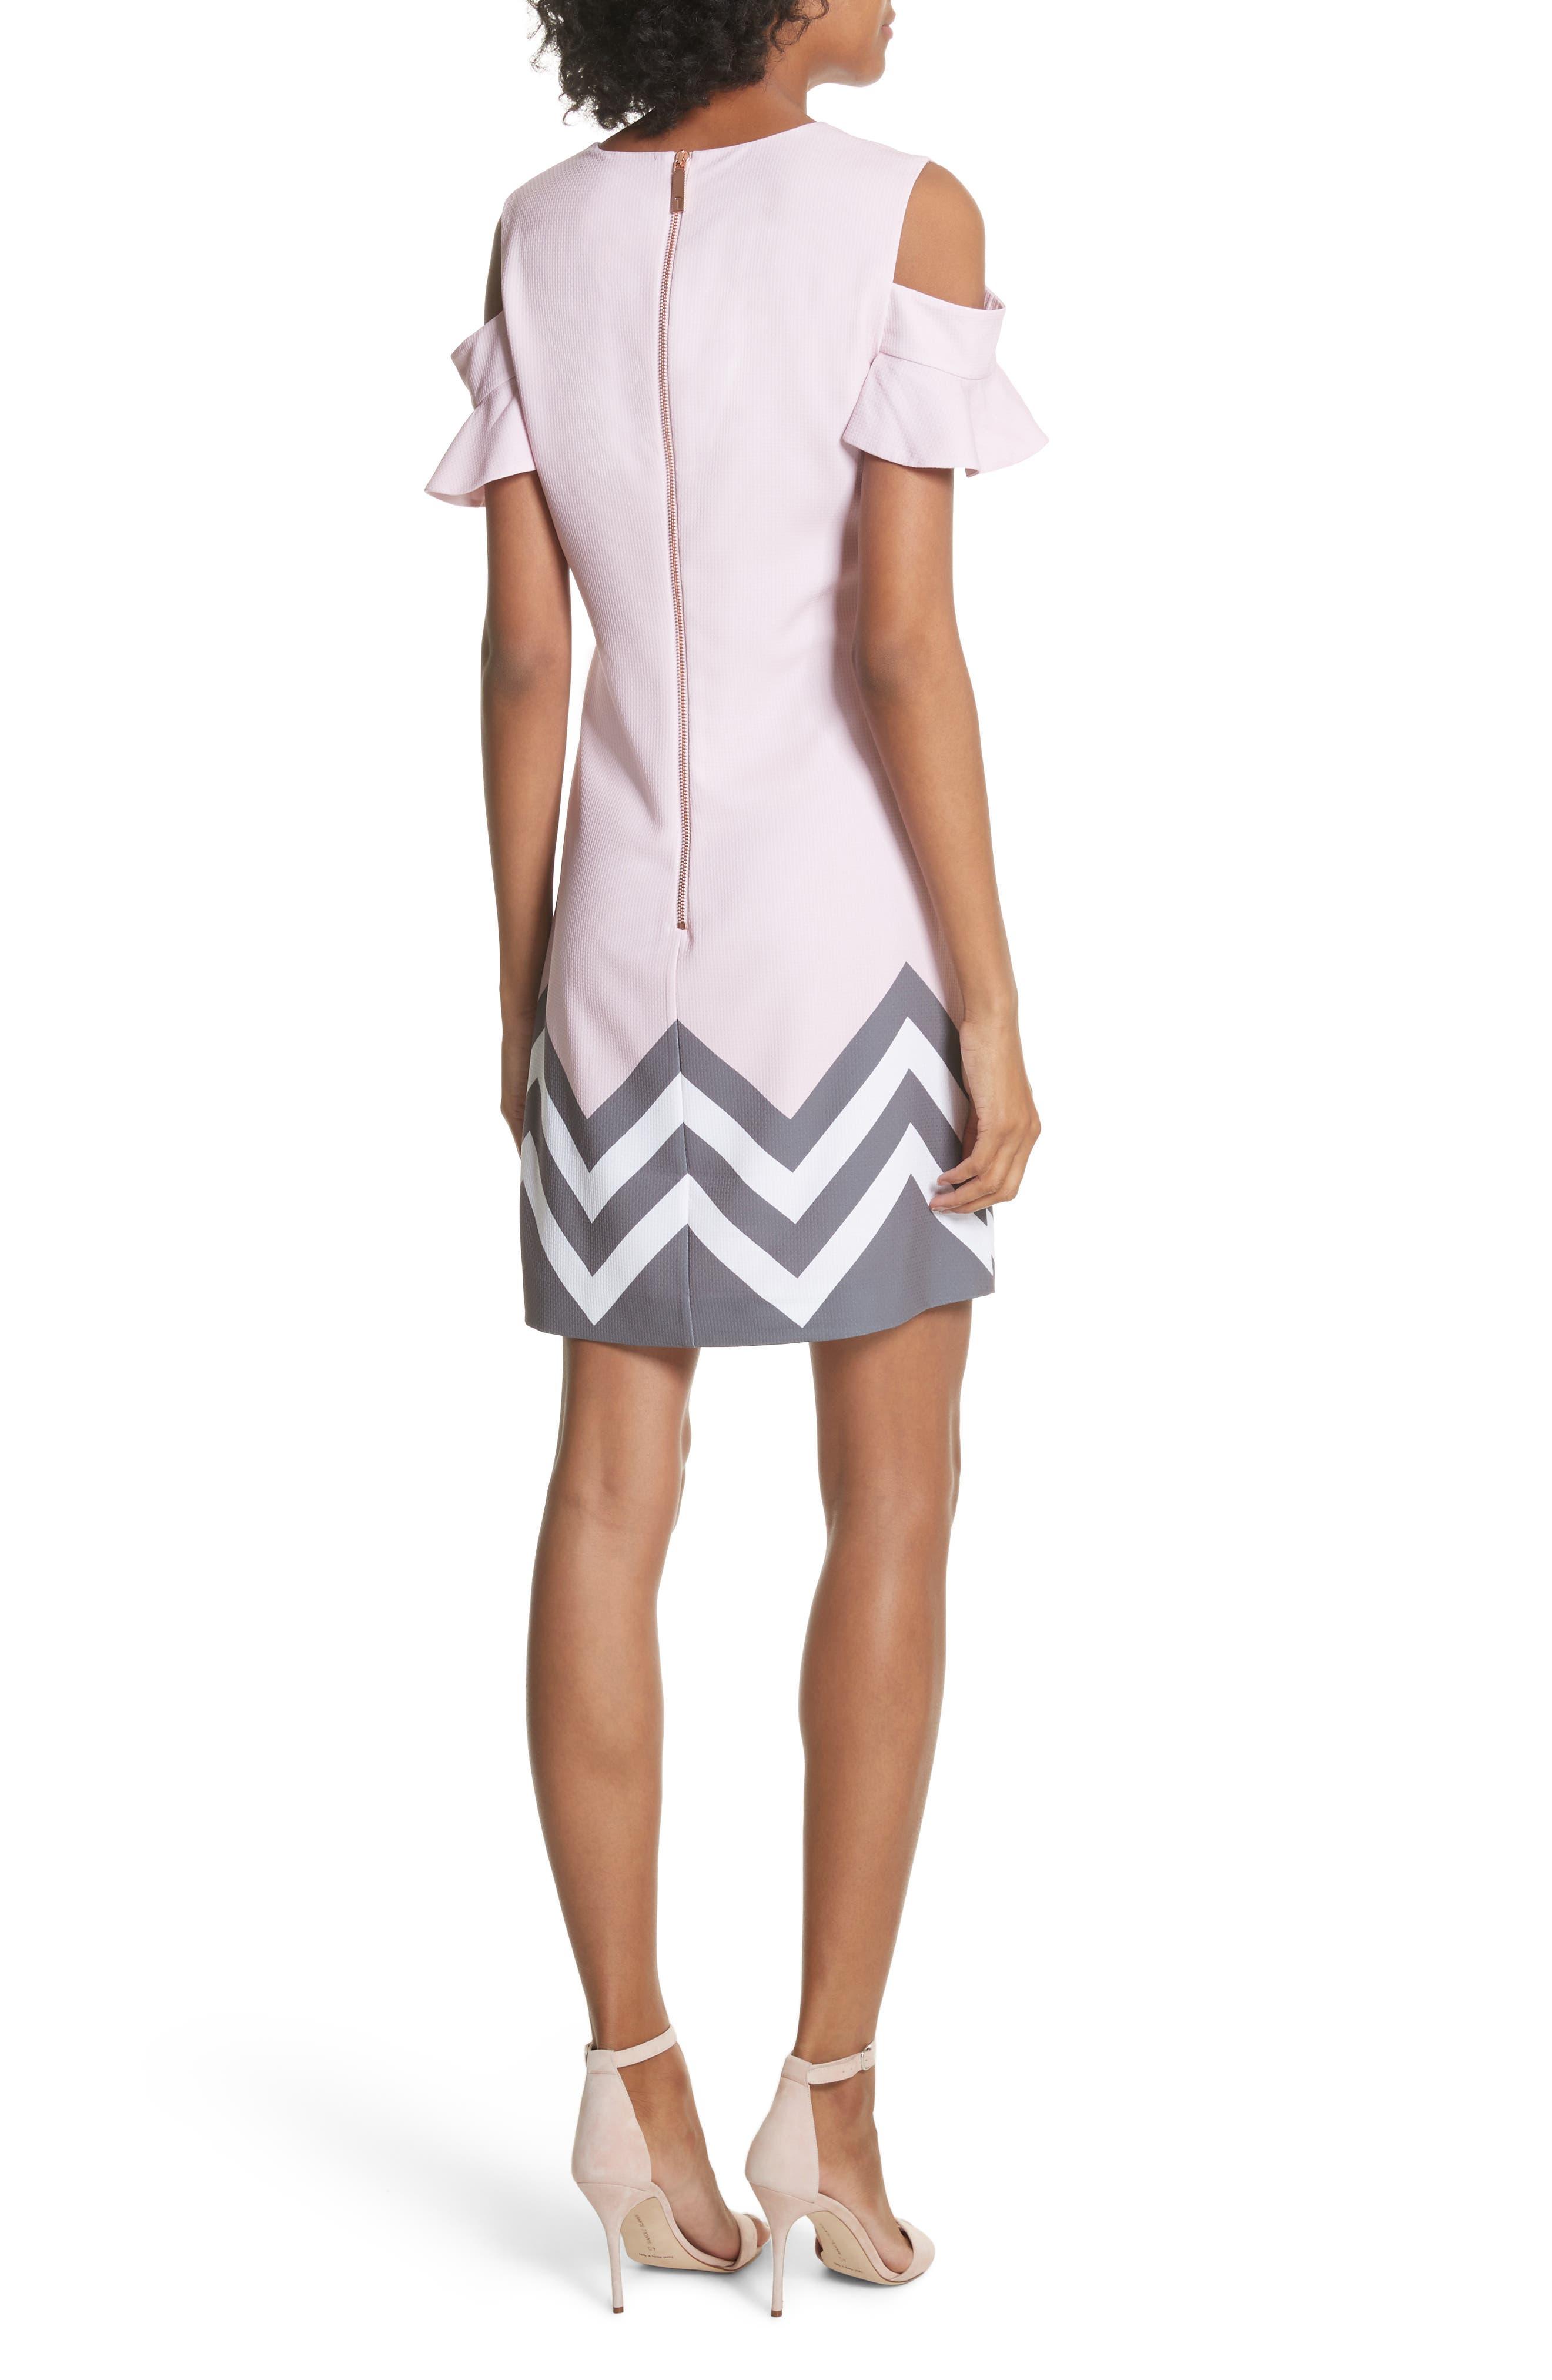 Jareye Cutout Tunic Dress,                             Alternate thumbnail 2, color,                             Dusky Pink